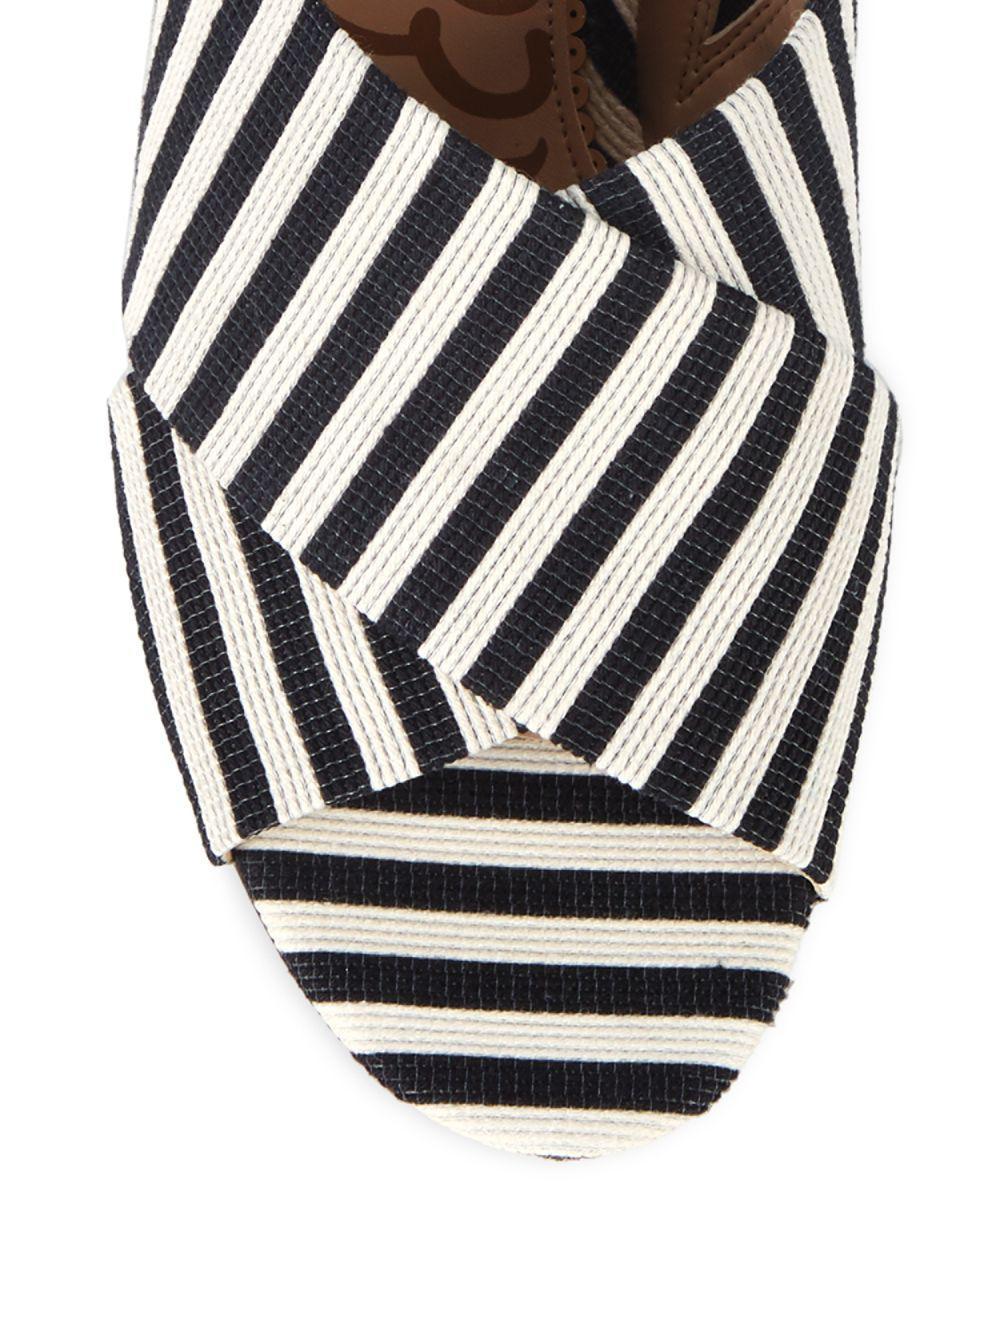 6282f8b8a7a7 Lyst - Sam Edelman Stanley Striped Block Heel Mules in Black